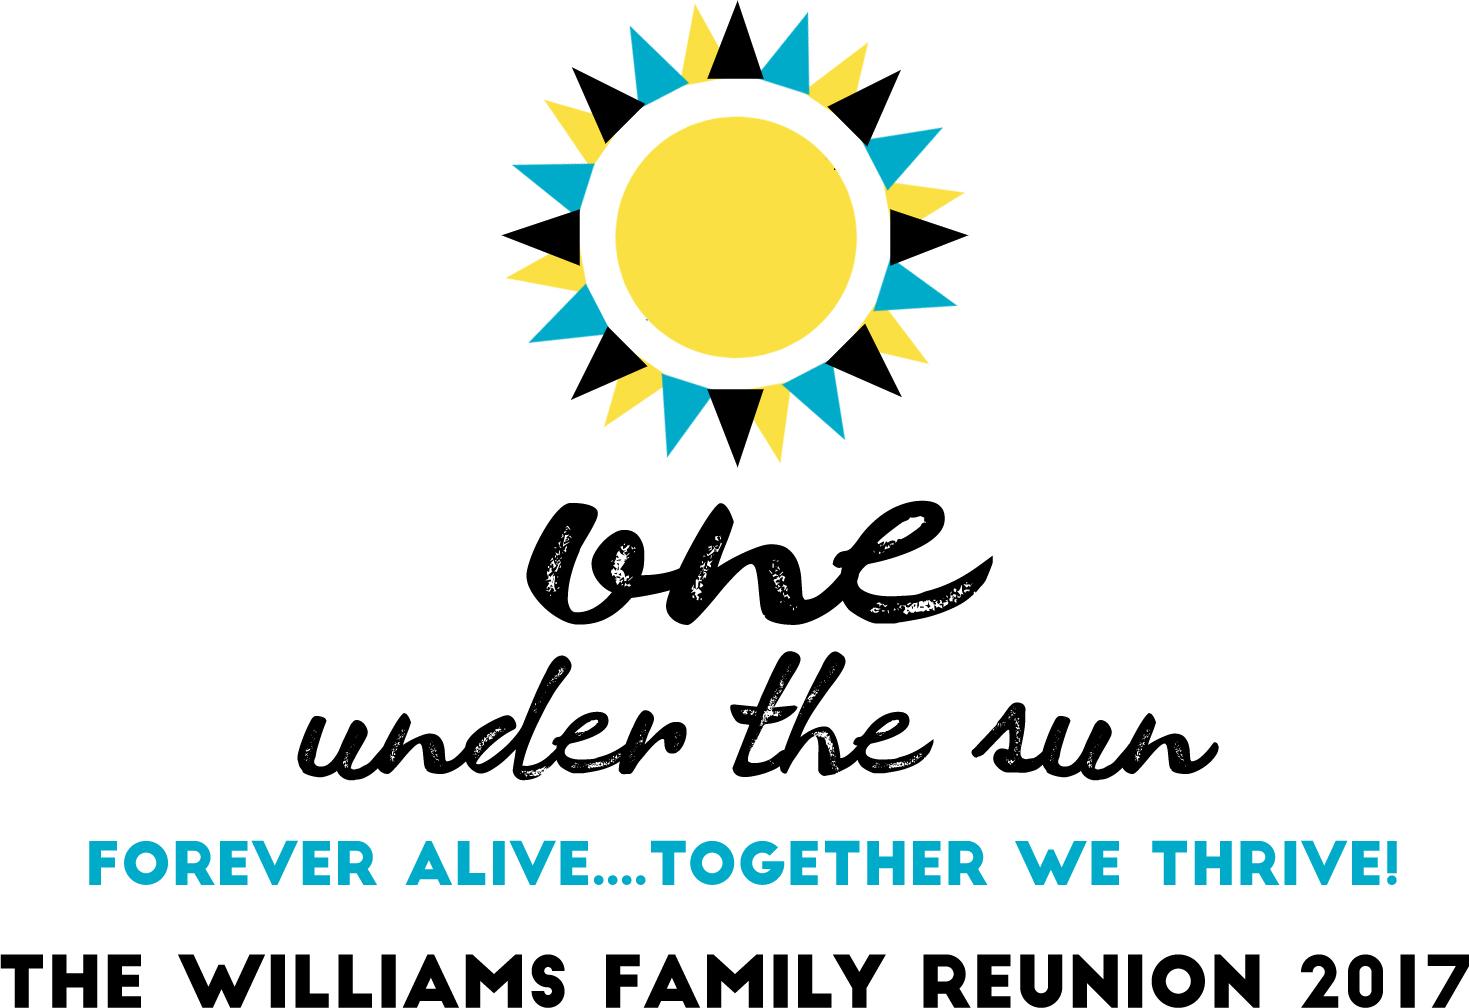 2017 Williams Family Reunion Logo and Theme - Orlando, FL